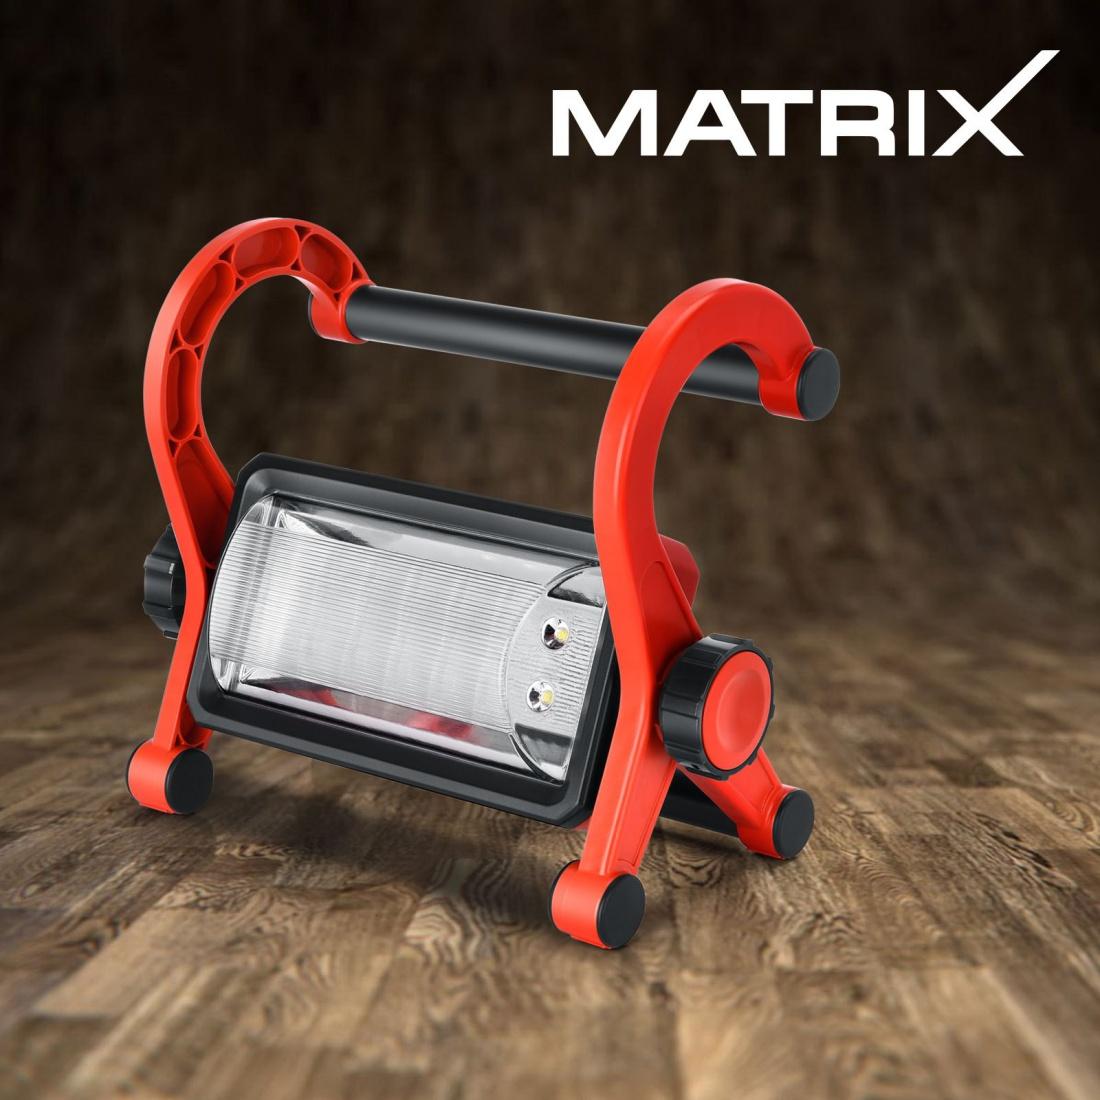 Matrix Cordless LED Work Light Rechargable Lamp Flashlight 20V Li-Ion Skin Only